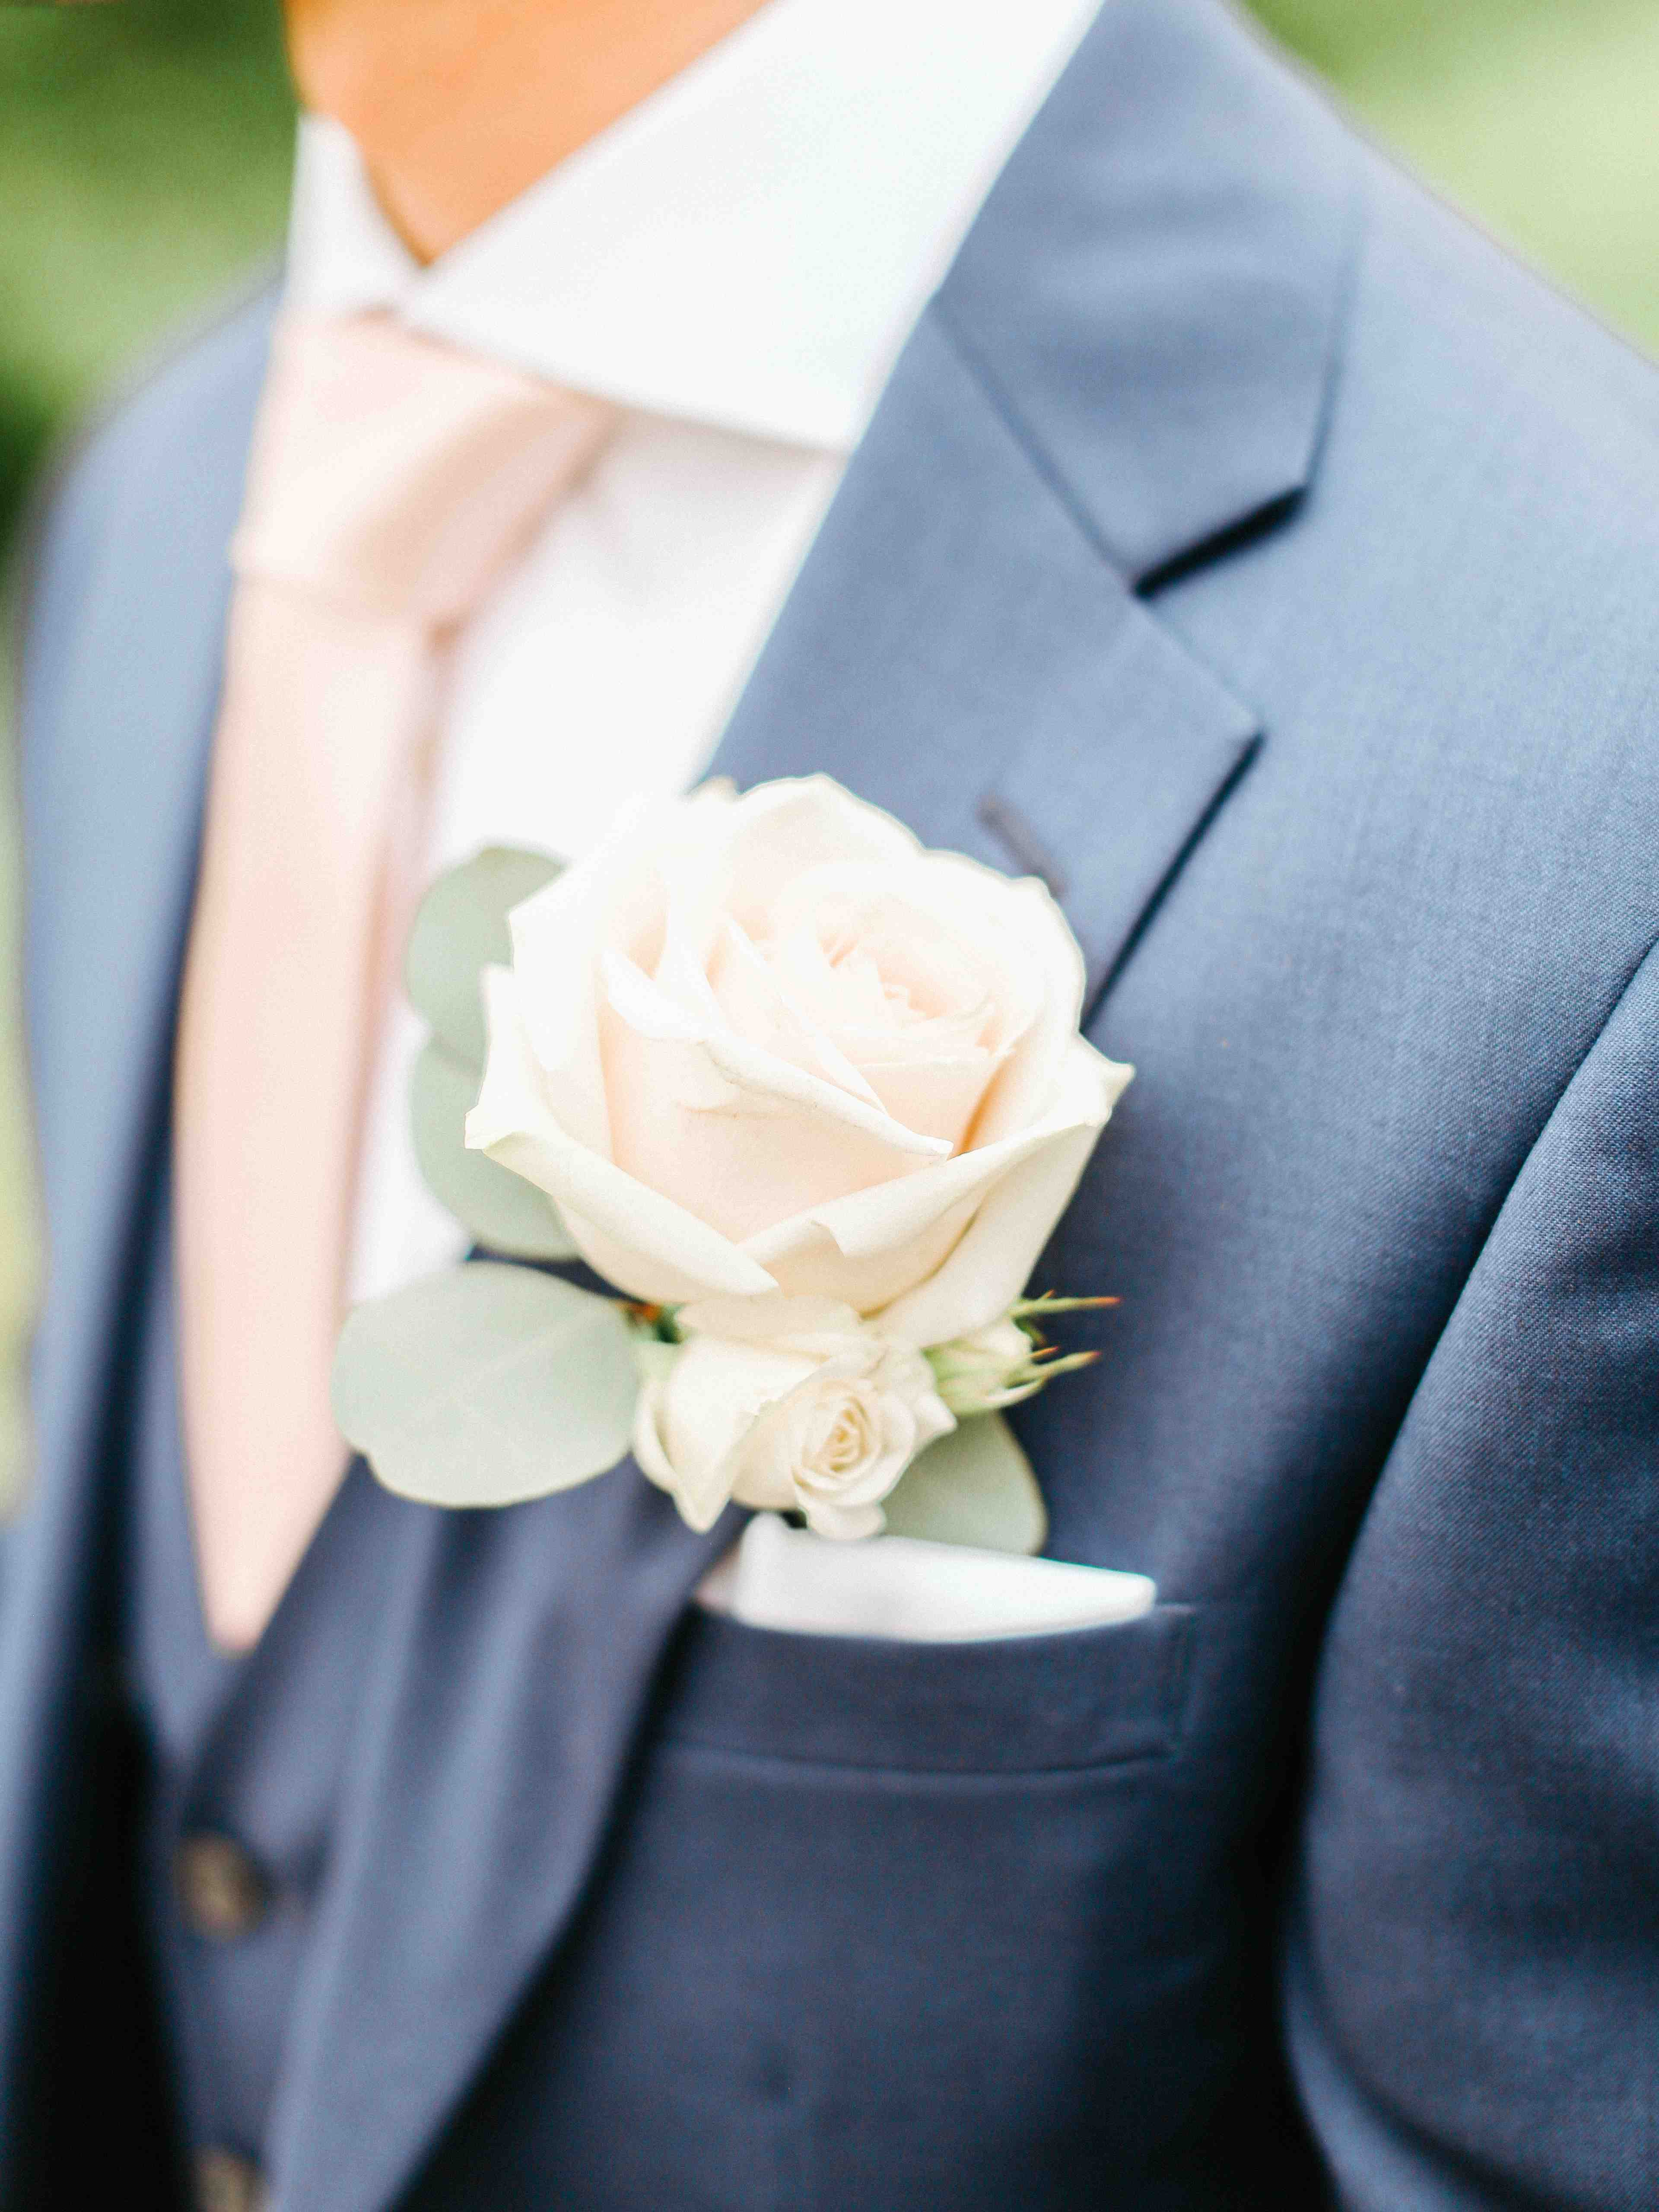 Spring Silchester House Wedding with Blush, White & Gold Colour Scheme